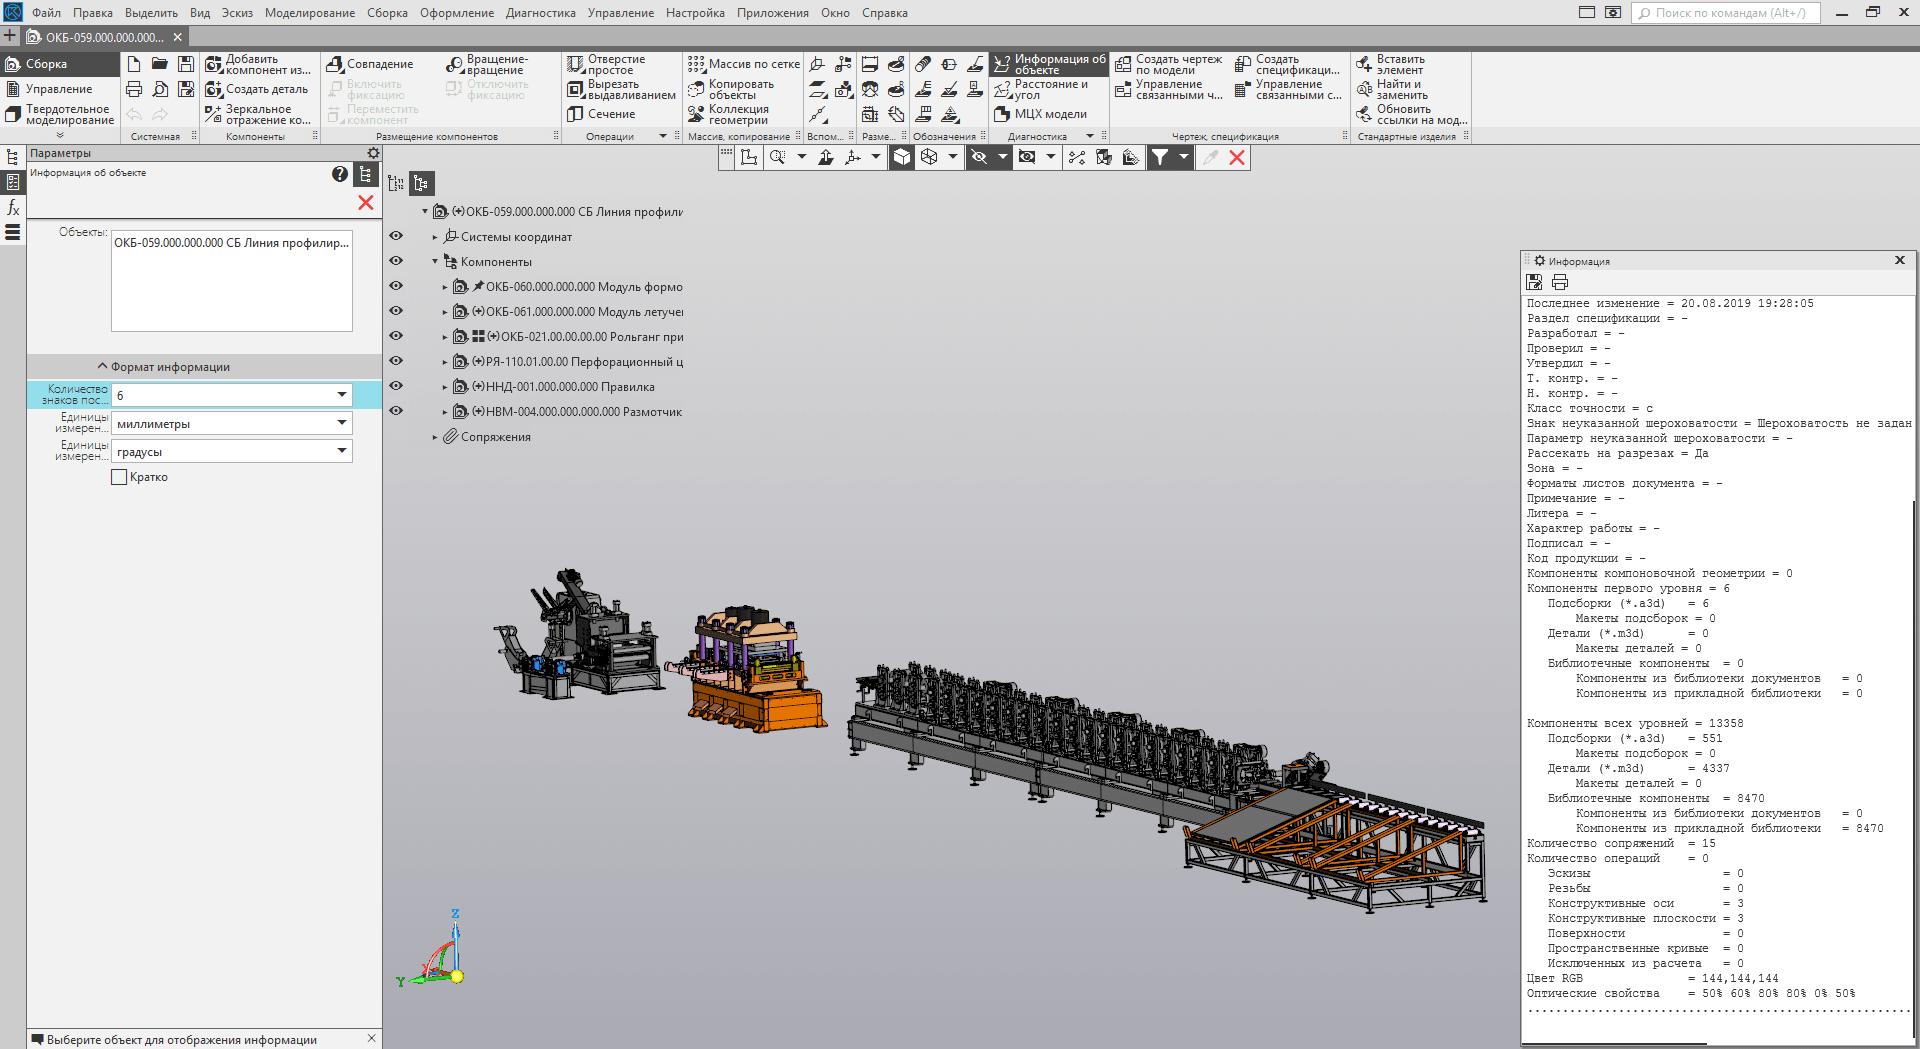 2807102-compressor